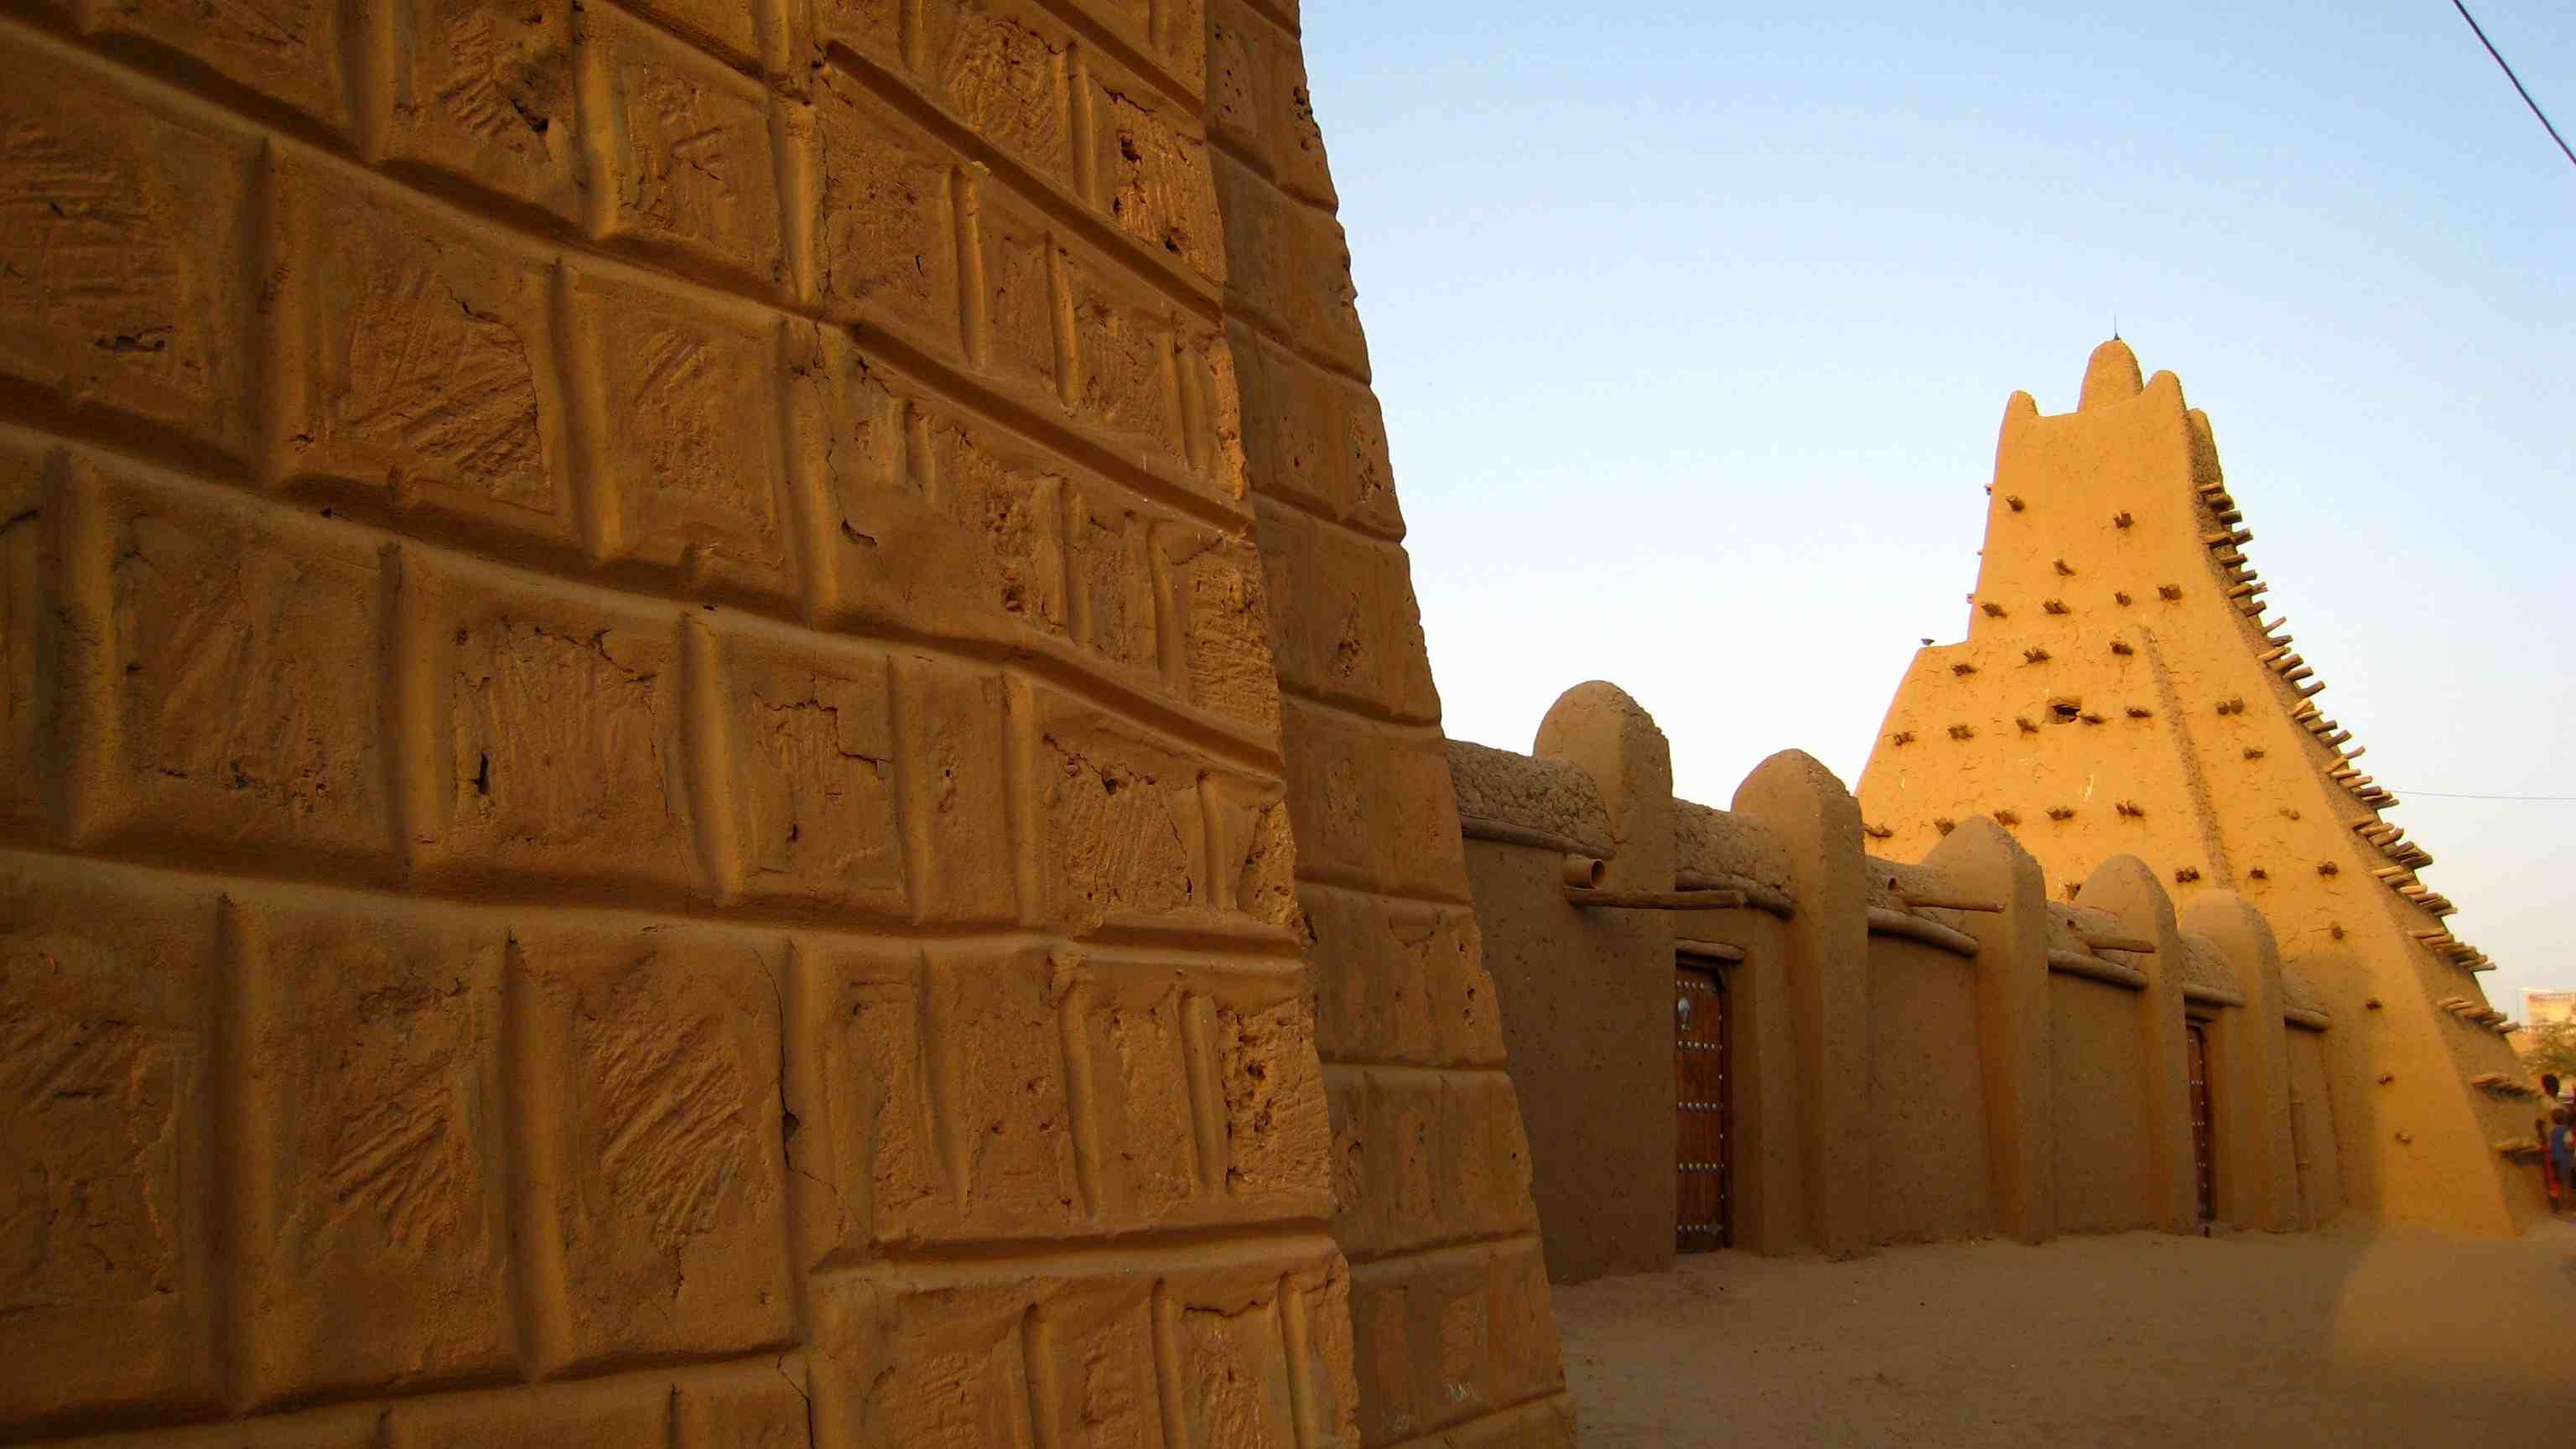 Islamic architecture in Western Africa